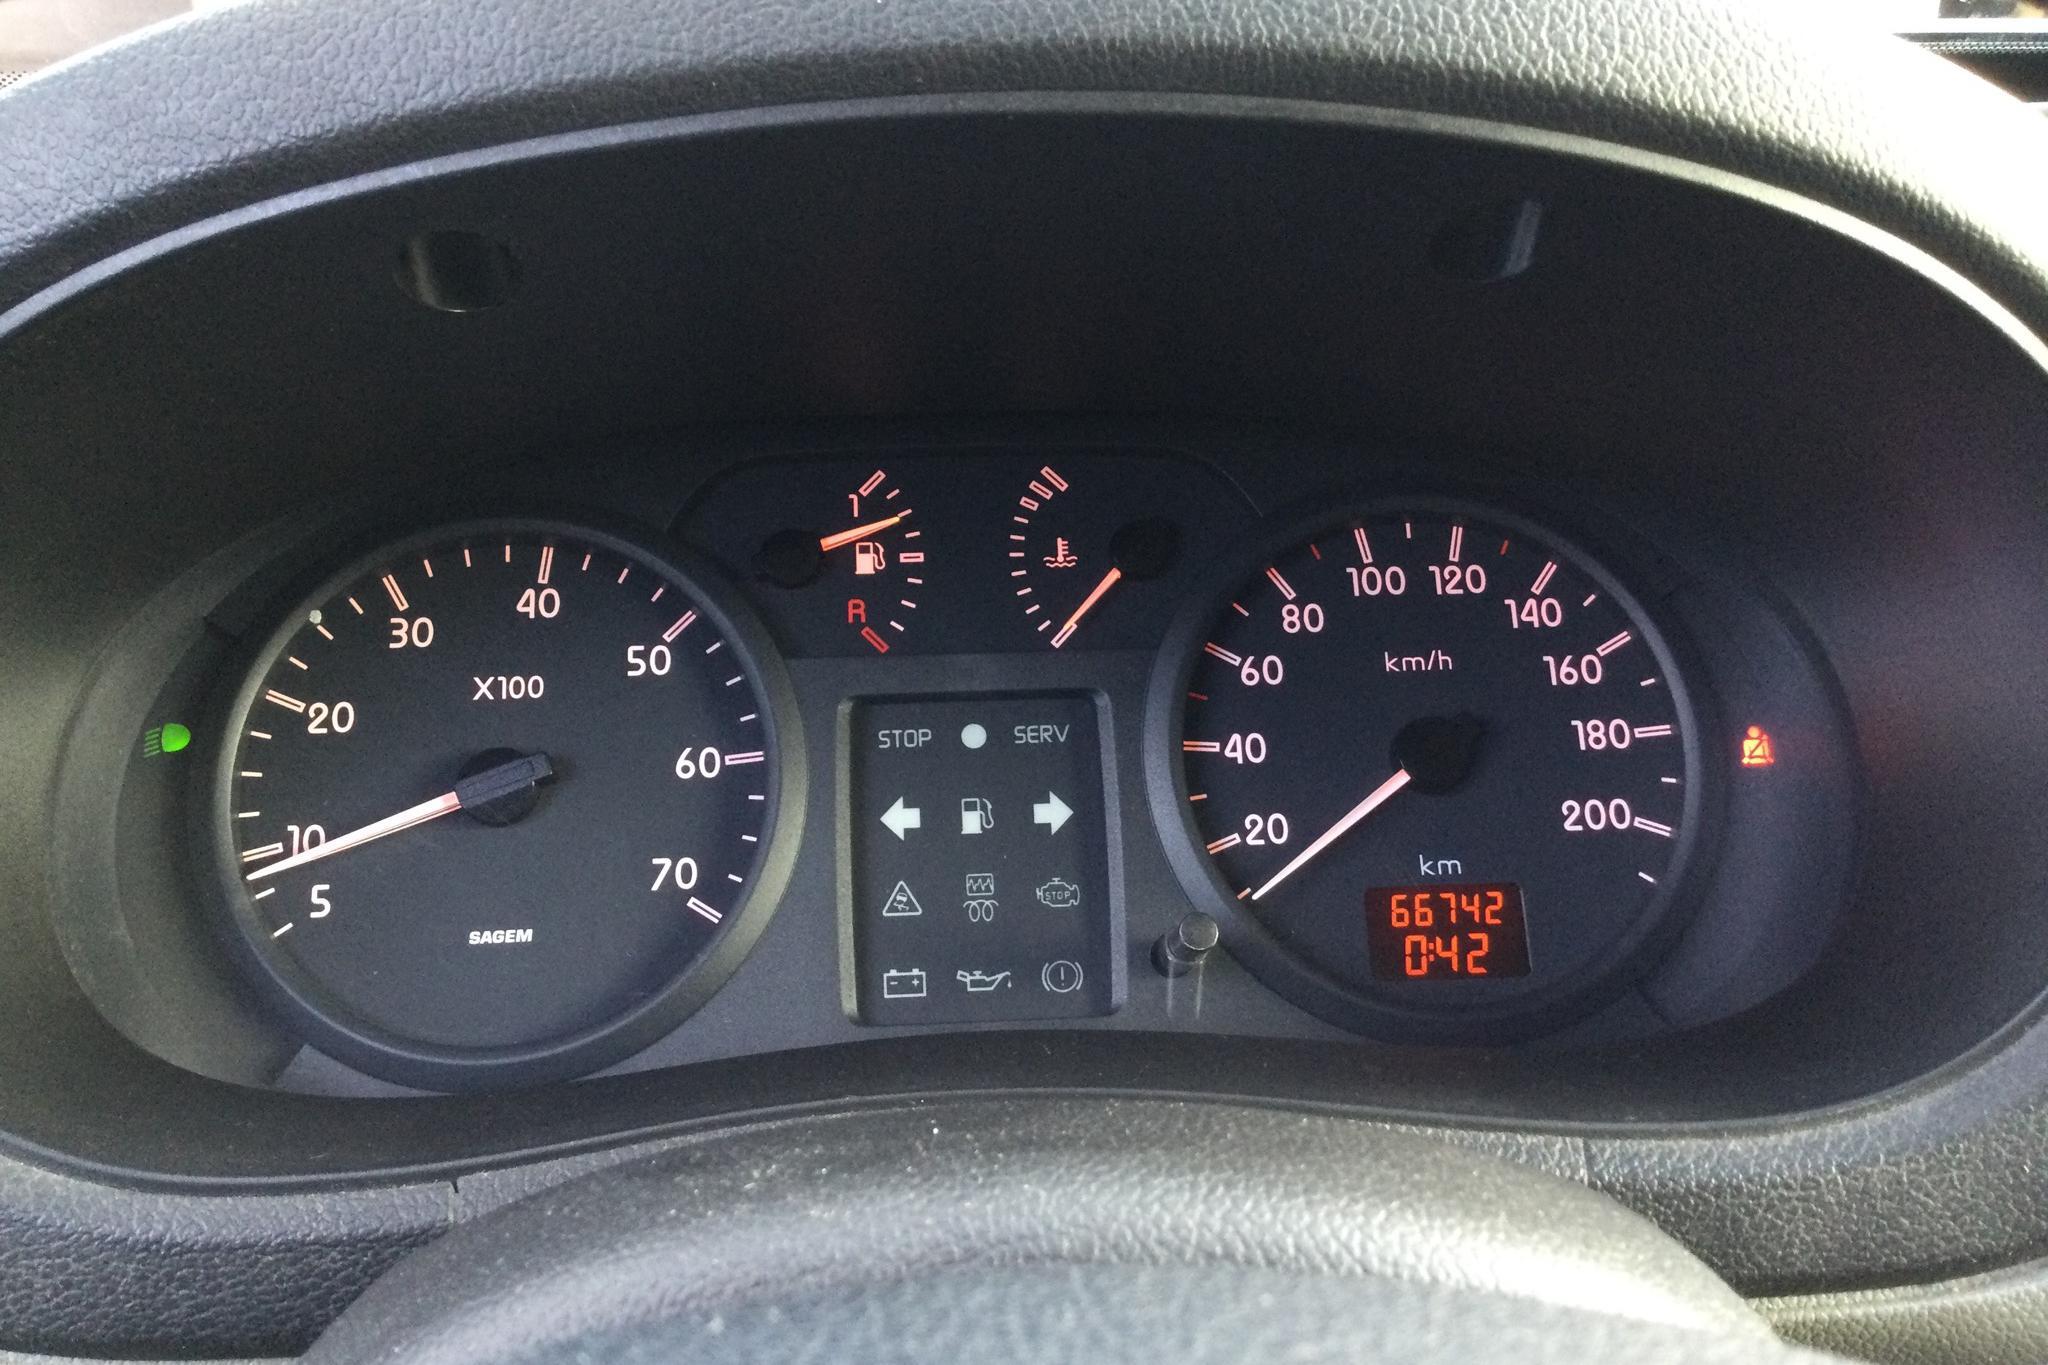 Renault Kangoo Express 1.5 dCi Skåp (65hk) - 6 674 mil - Manuell - Dark Blue - 2004